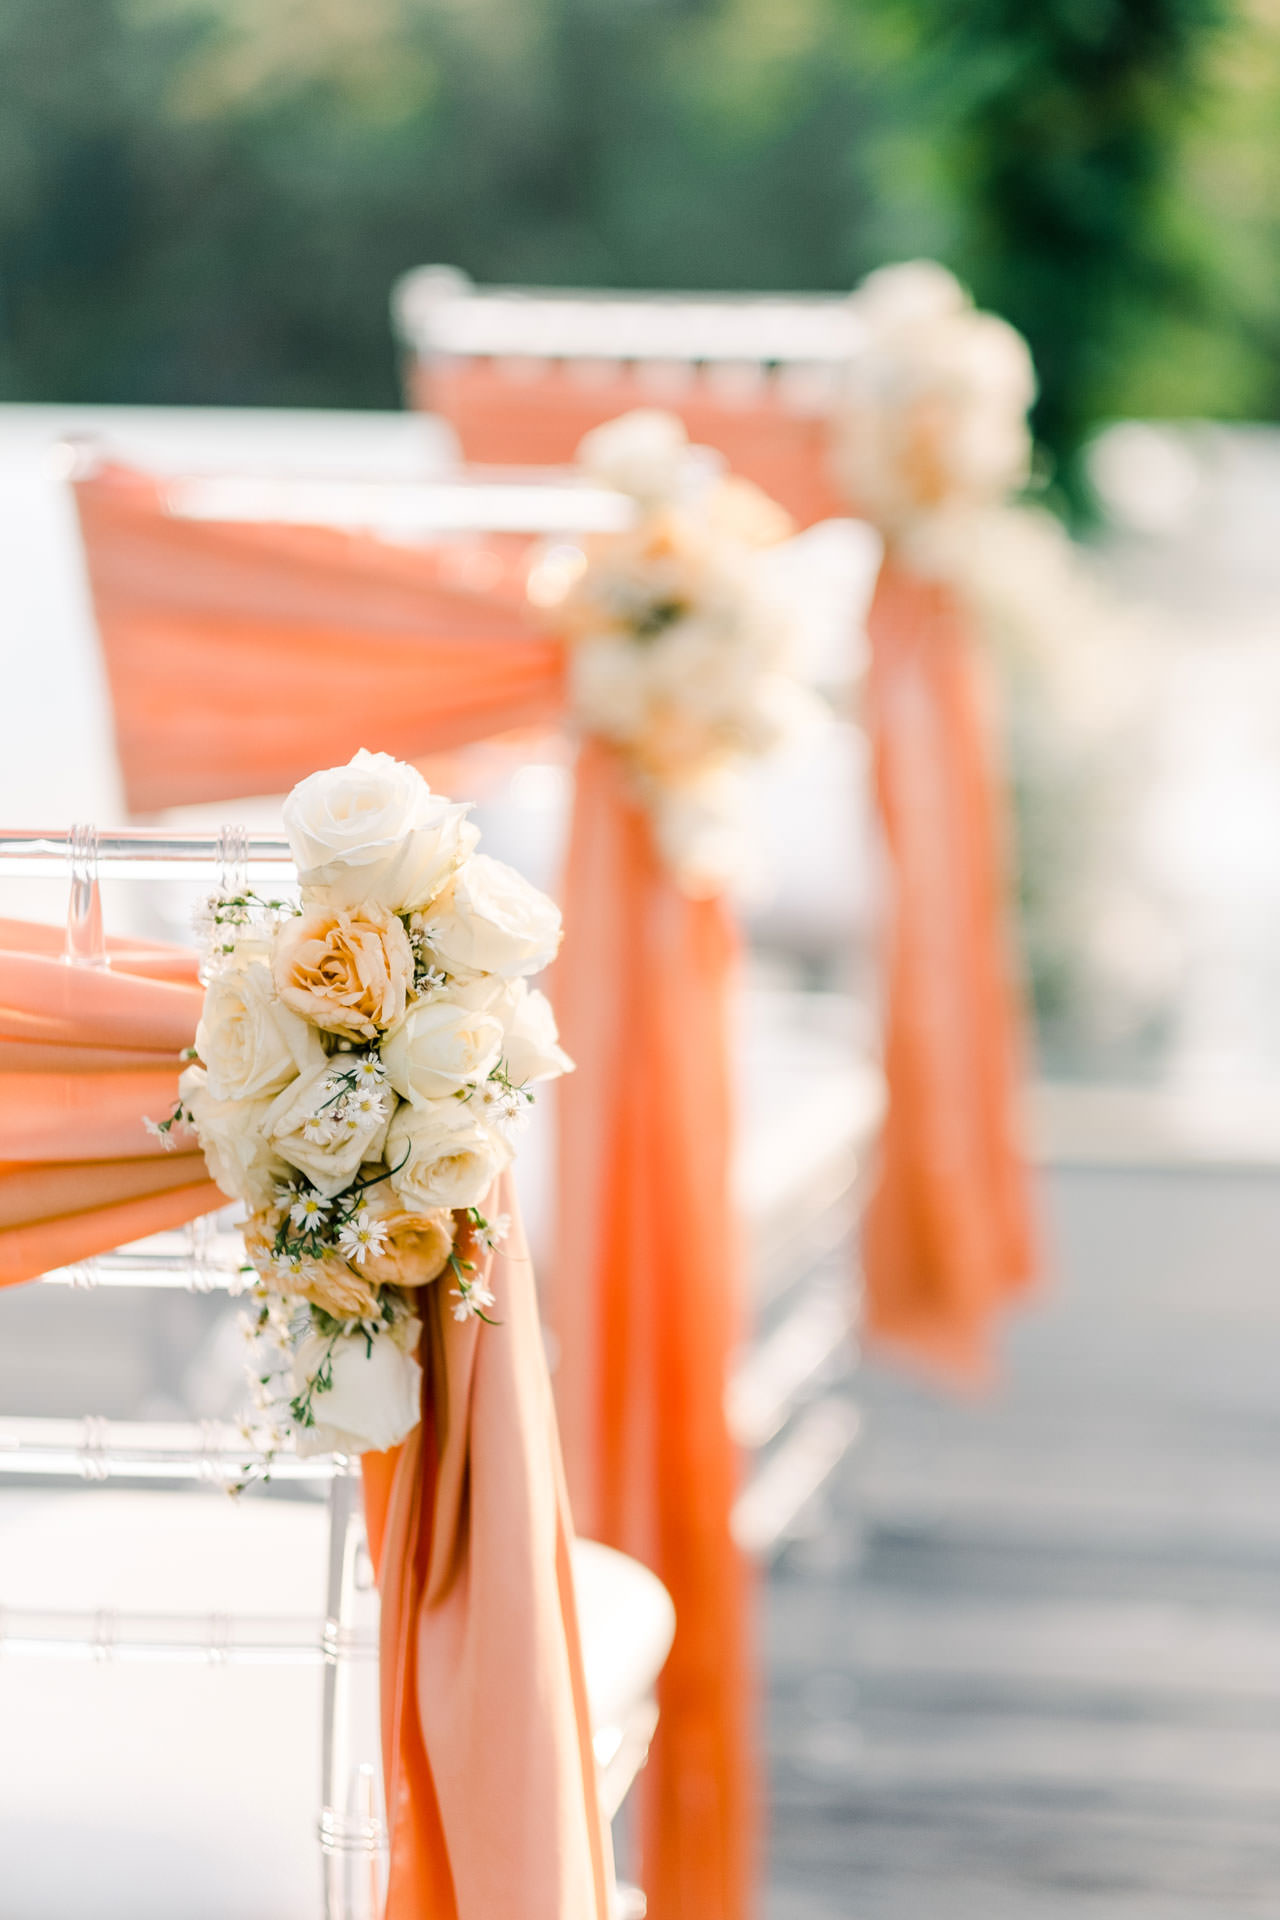 Ubud Wedding at Bisma Eight - Bali Editorial Style Photography 4